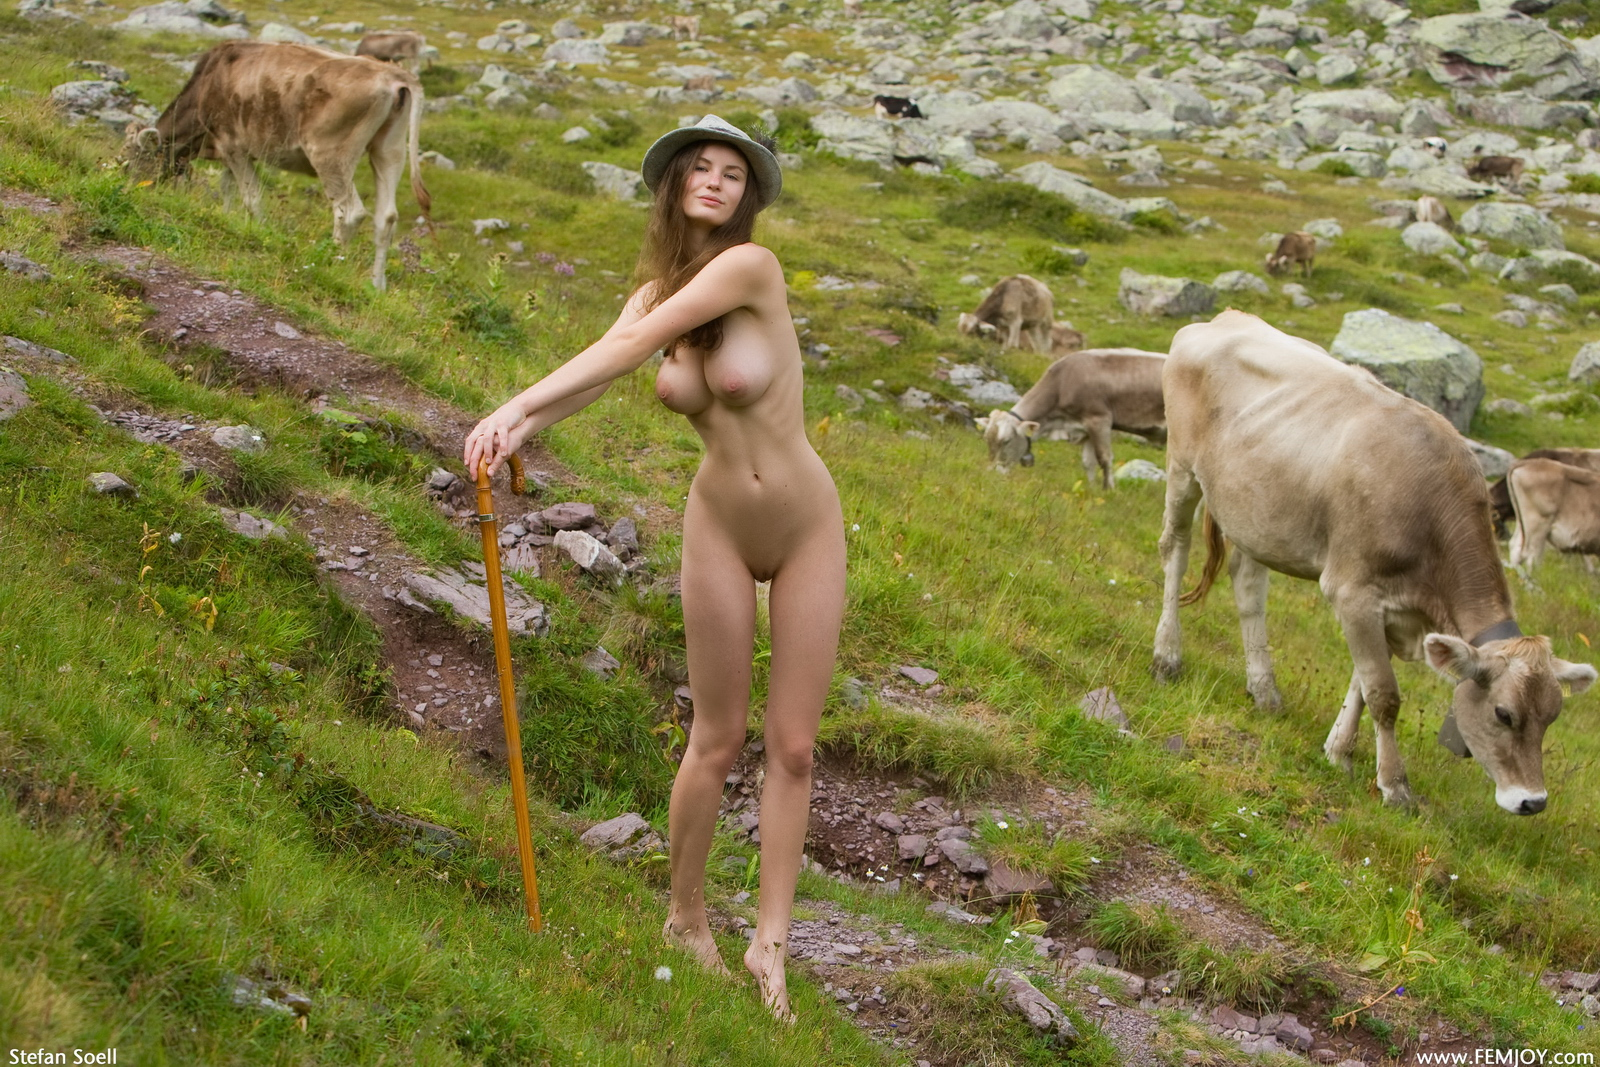 susann-tits-cowgirl-hat-shepherd-naked-femjoy-11